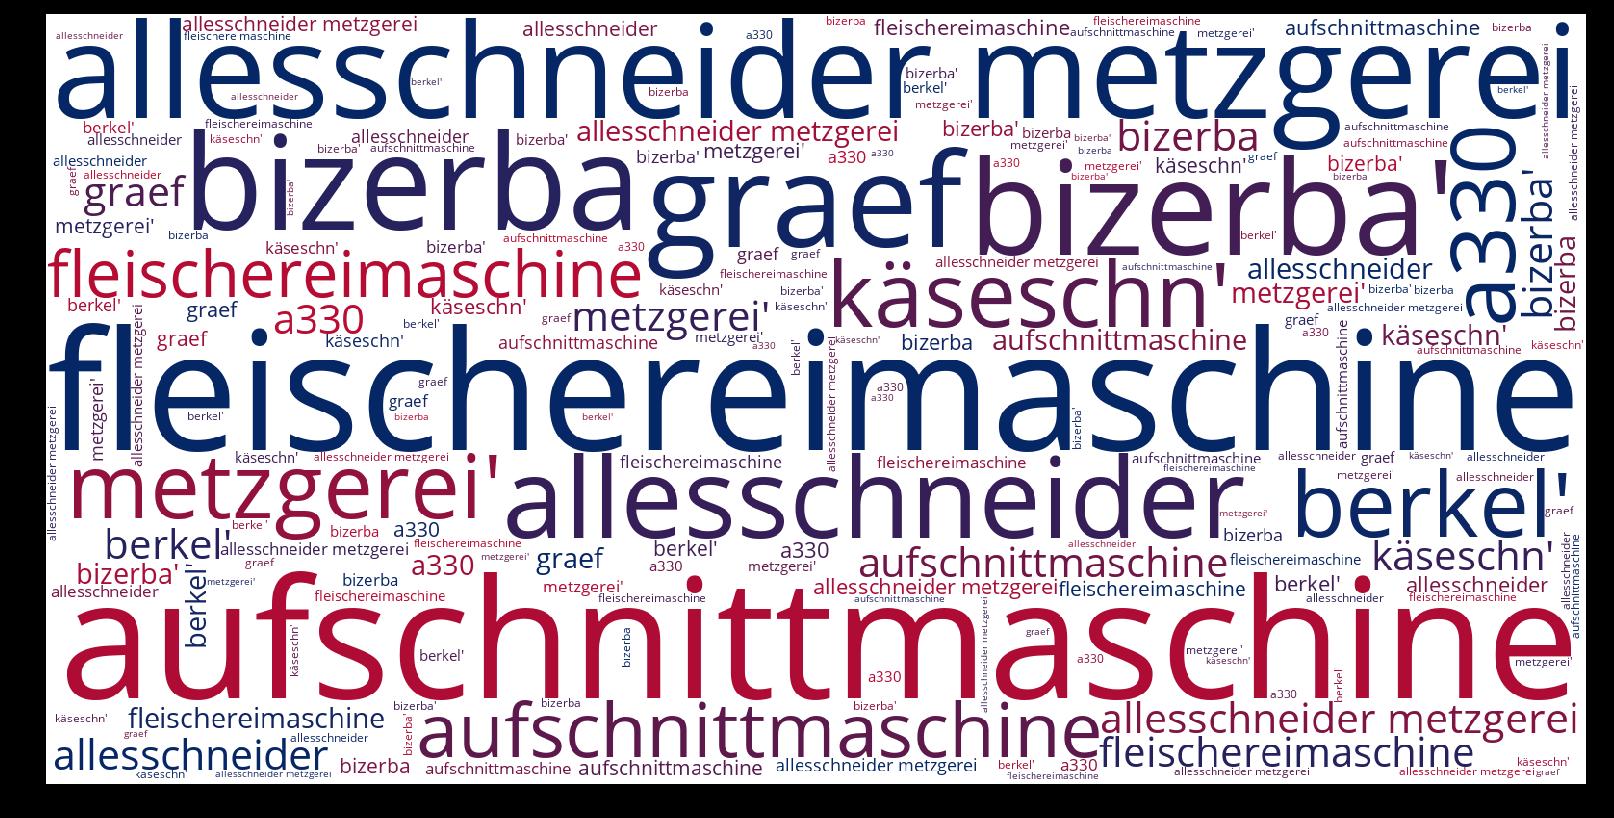 Fleischereimaschine-wordcloud